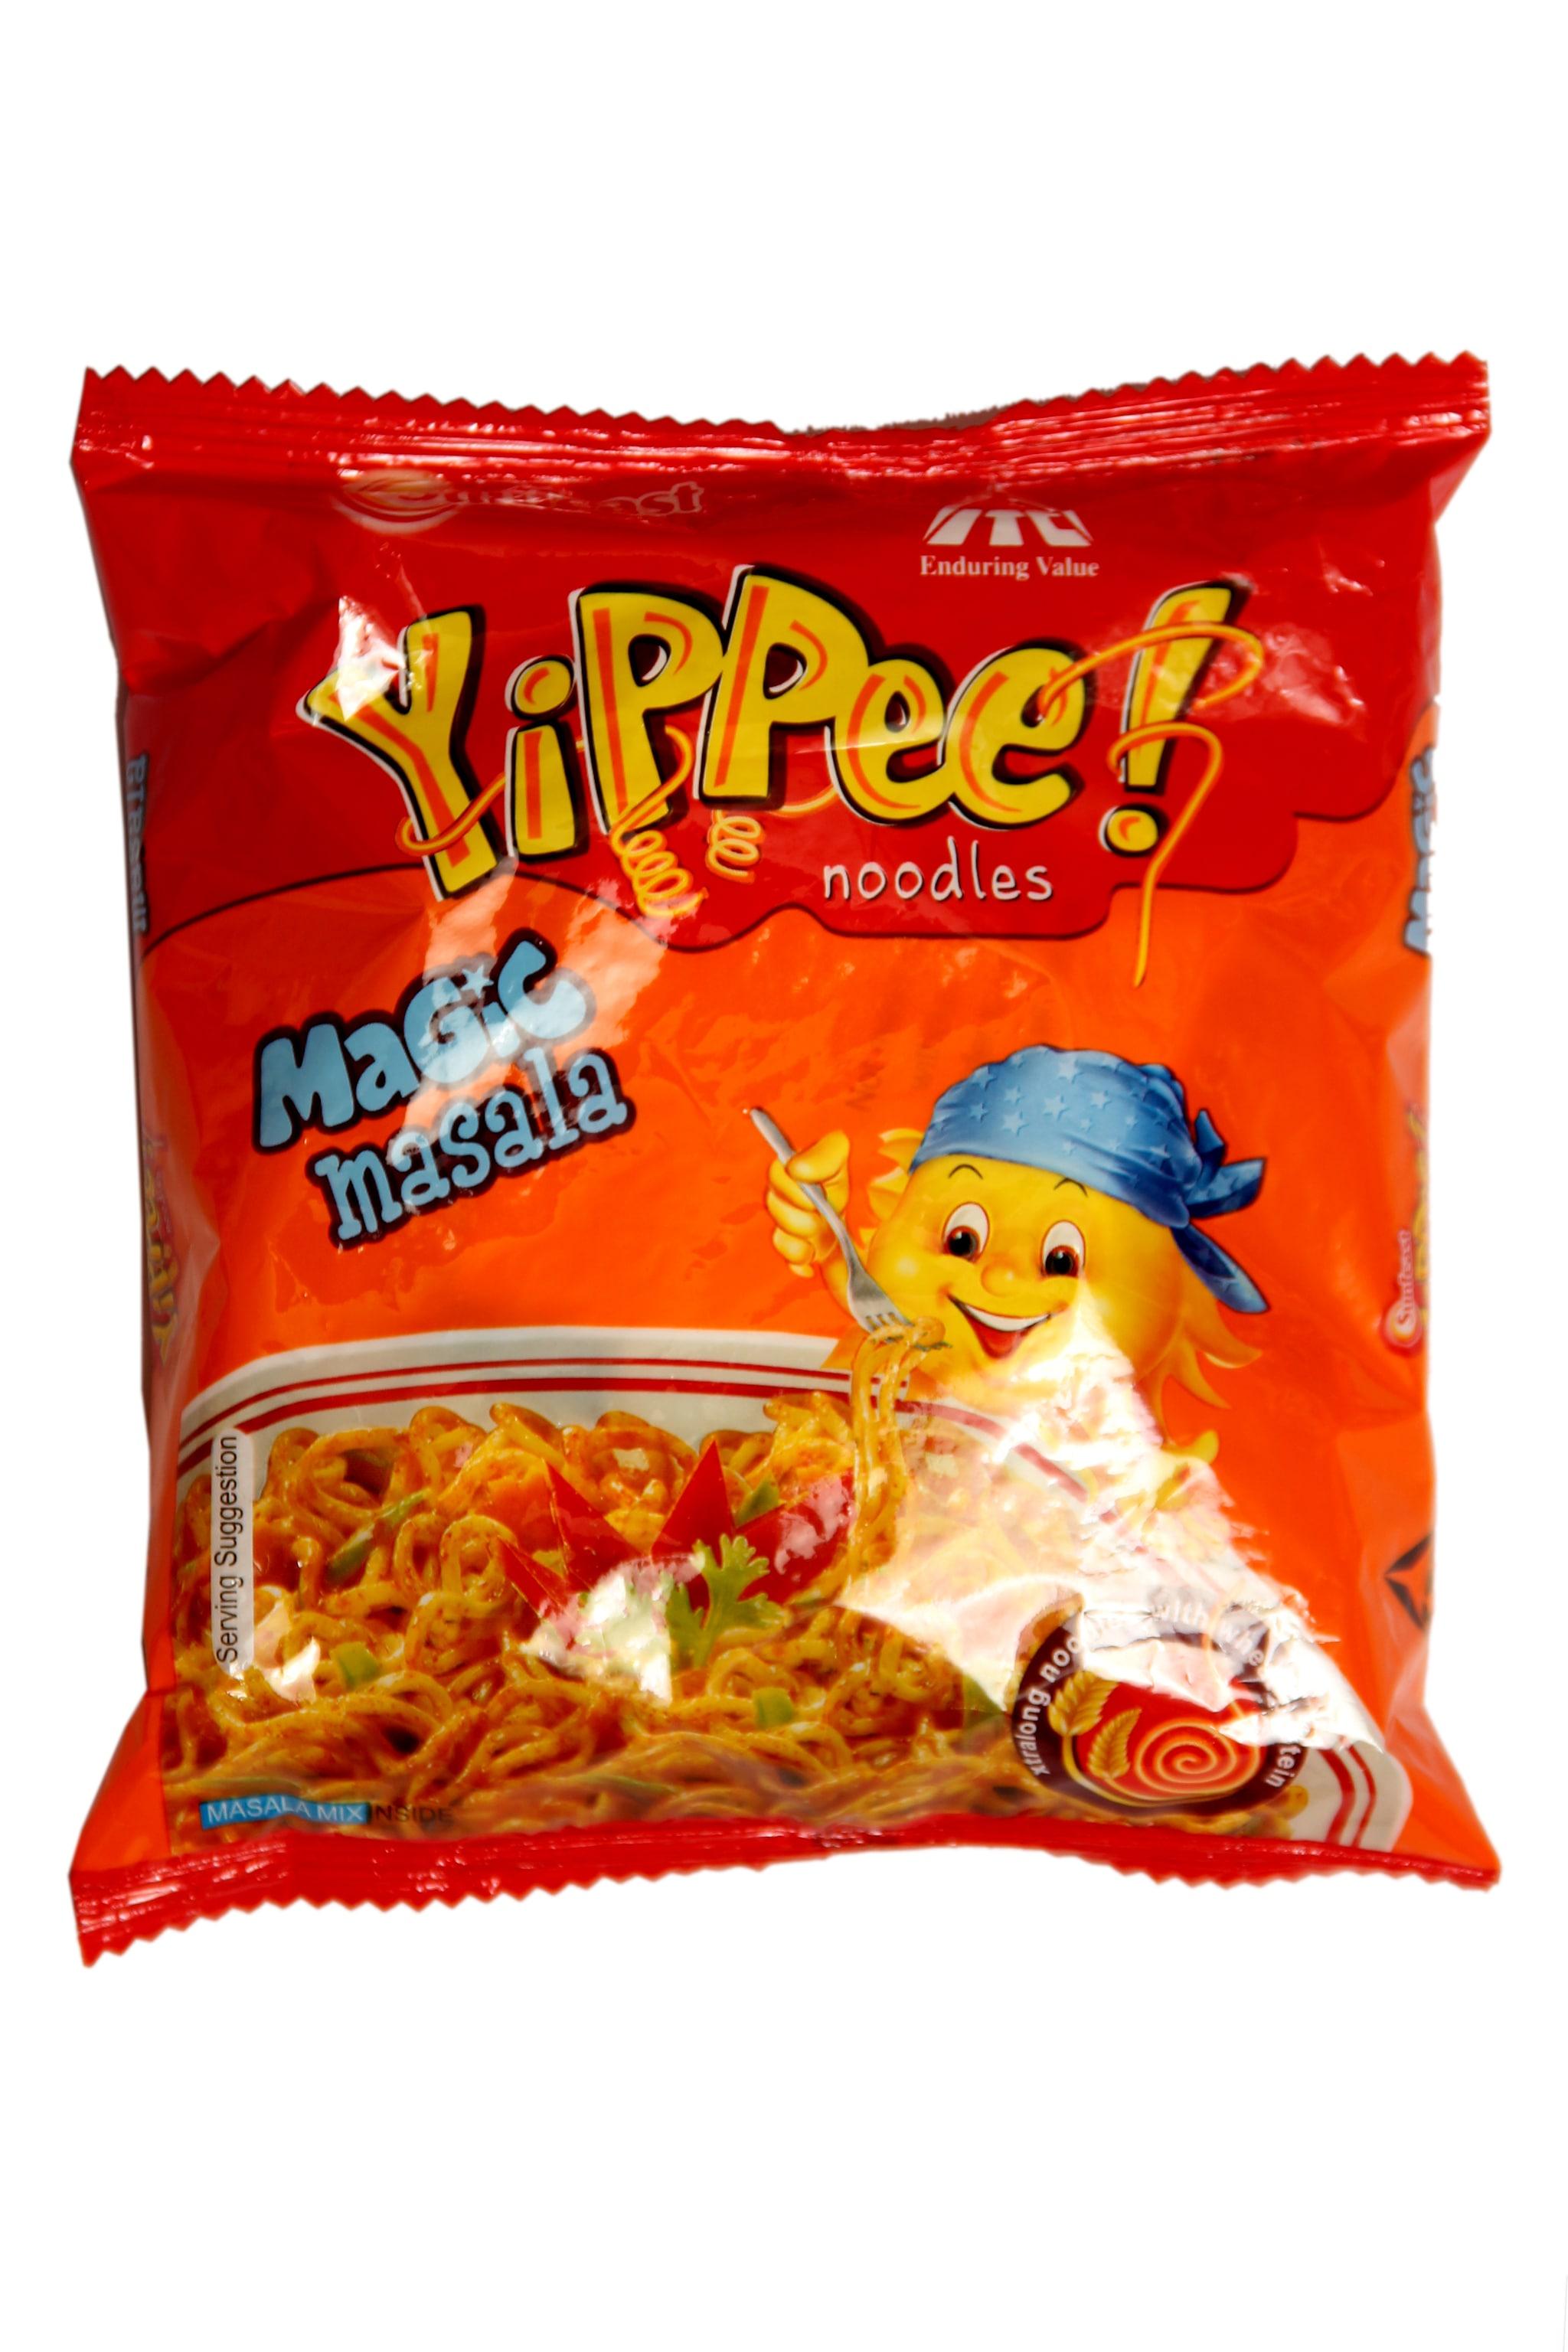 Yippee Magic Masala Noodles